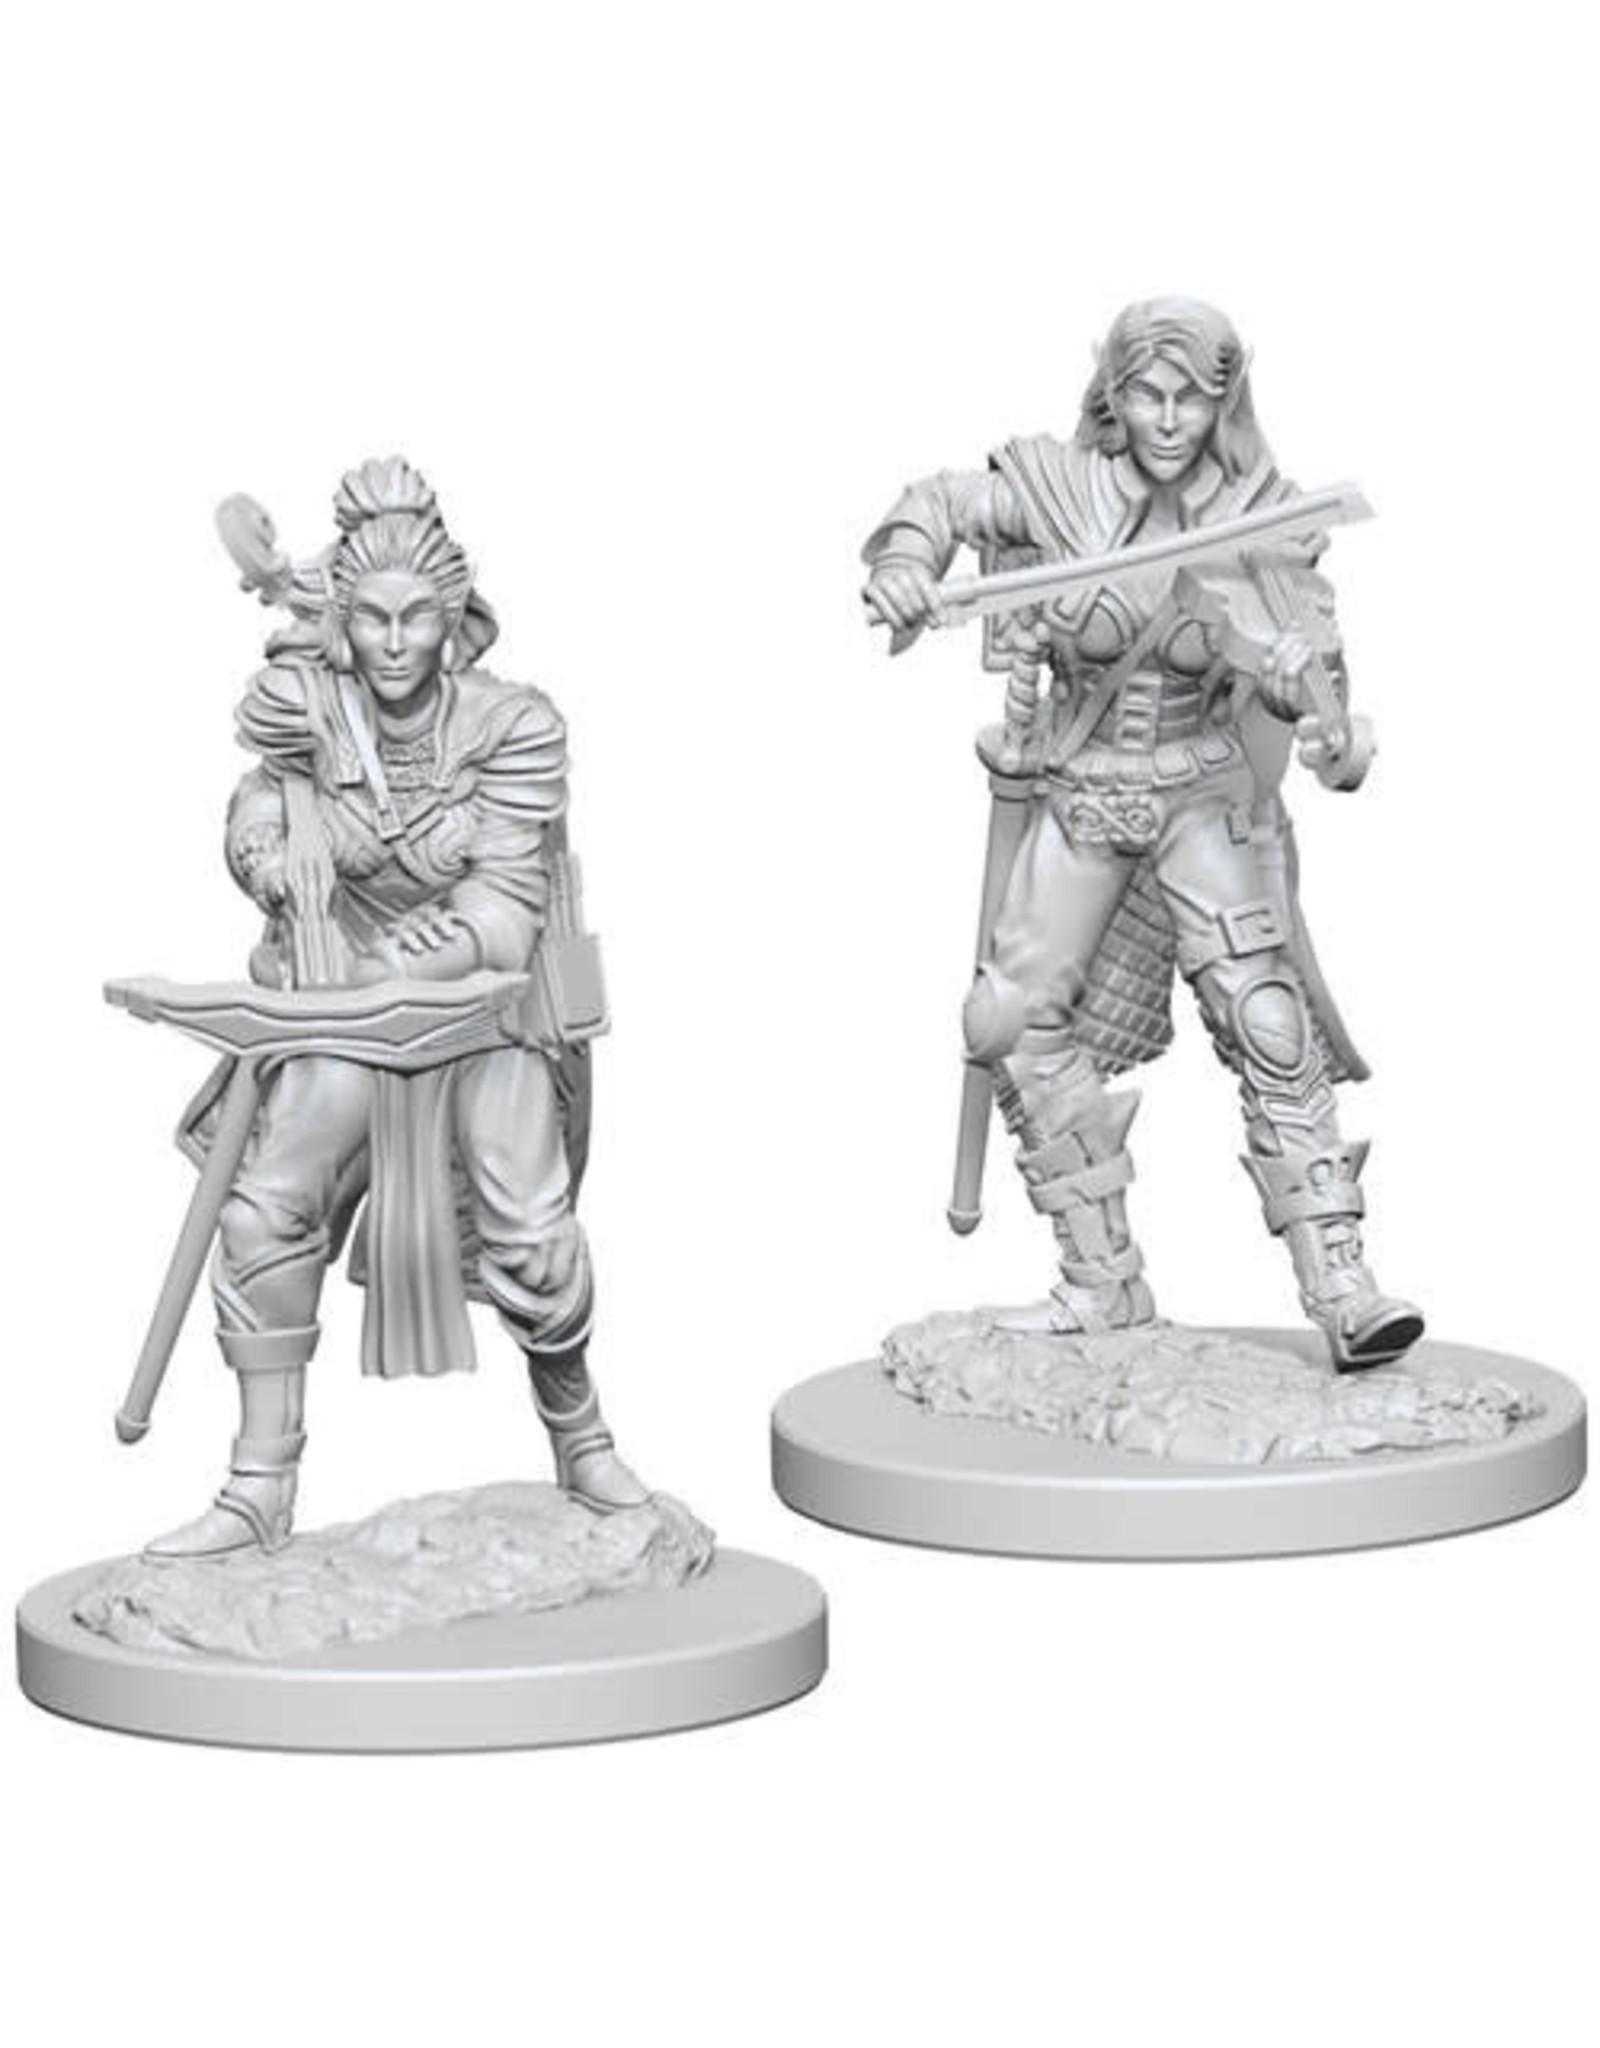 WizKids Pathfinder Deep Cuts Unpainted Miniatures: W4 Elf Female Bard